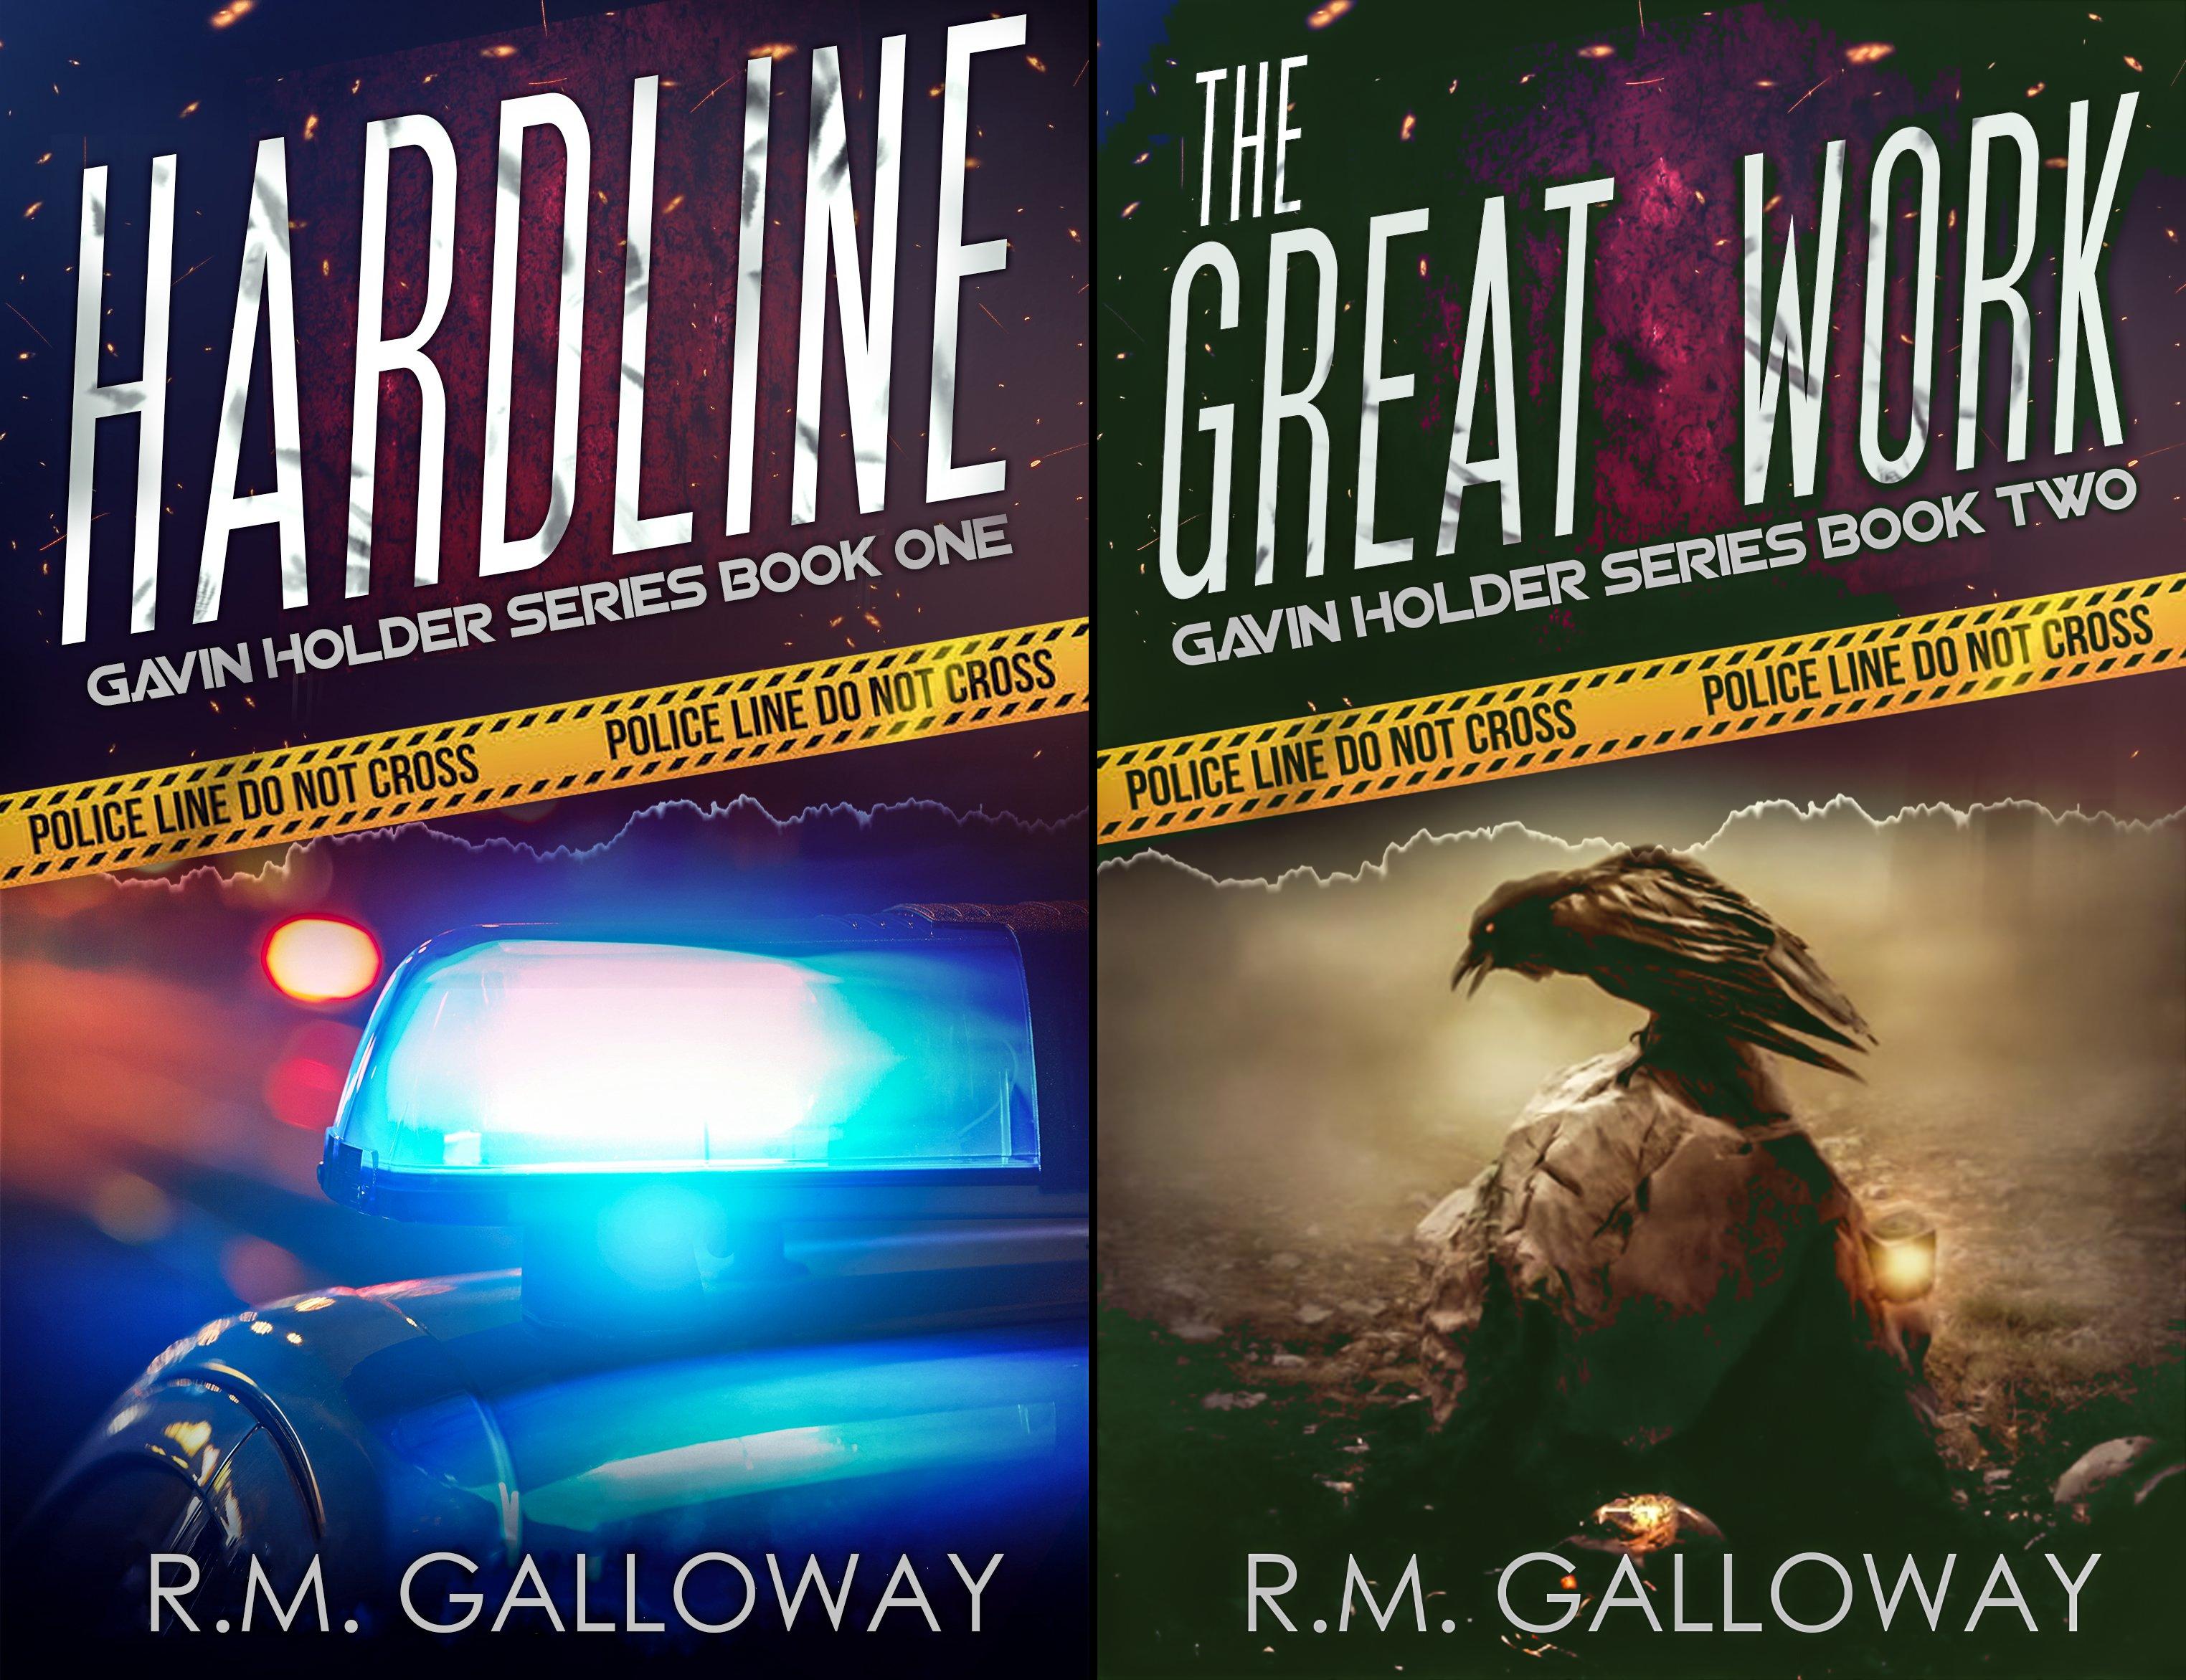 Gavin Holder Series (2 Book Series)